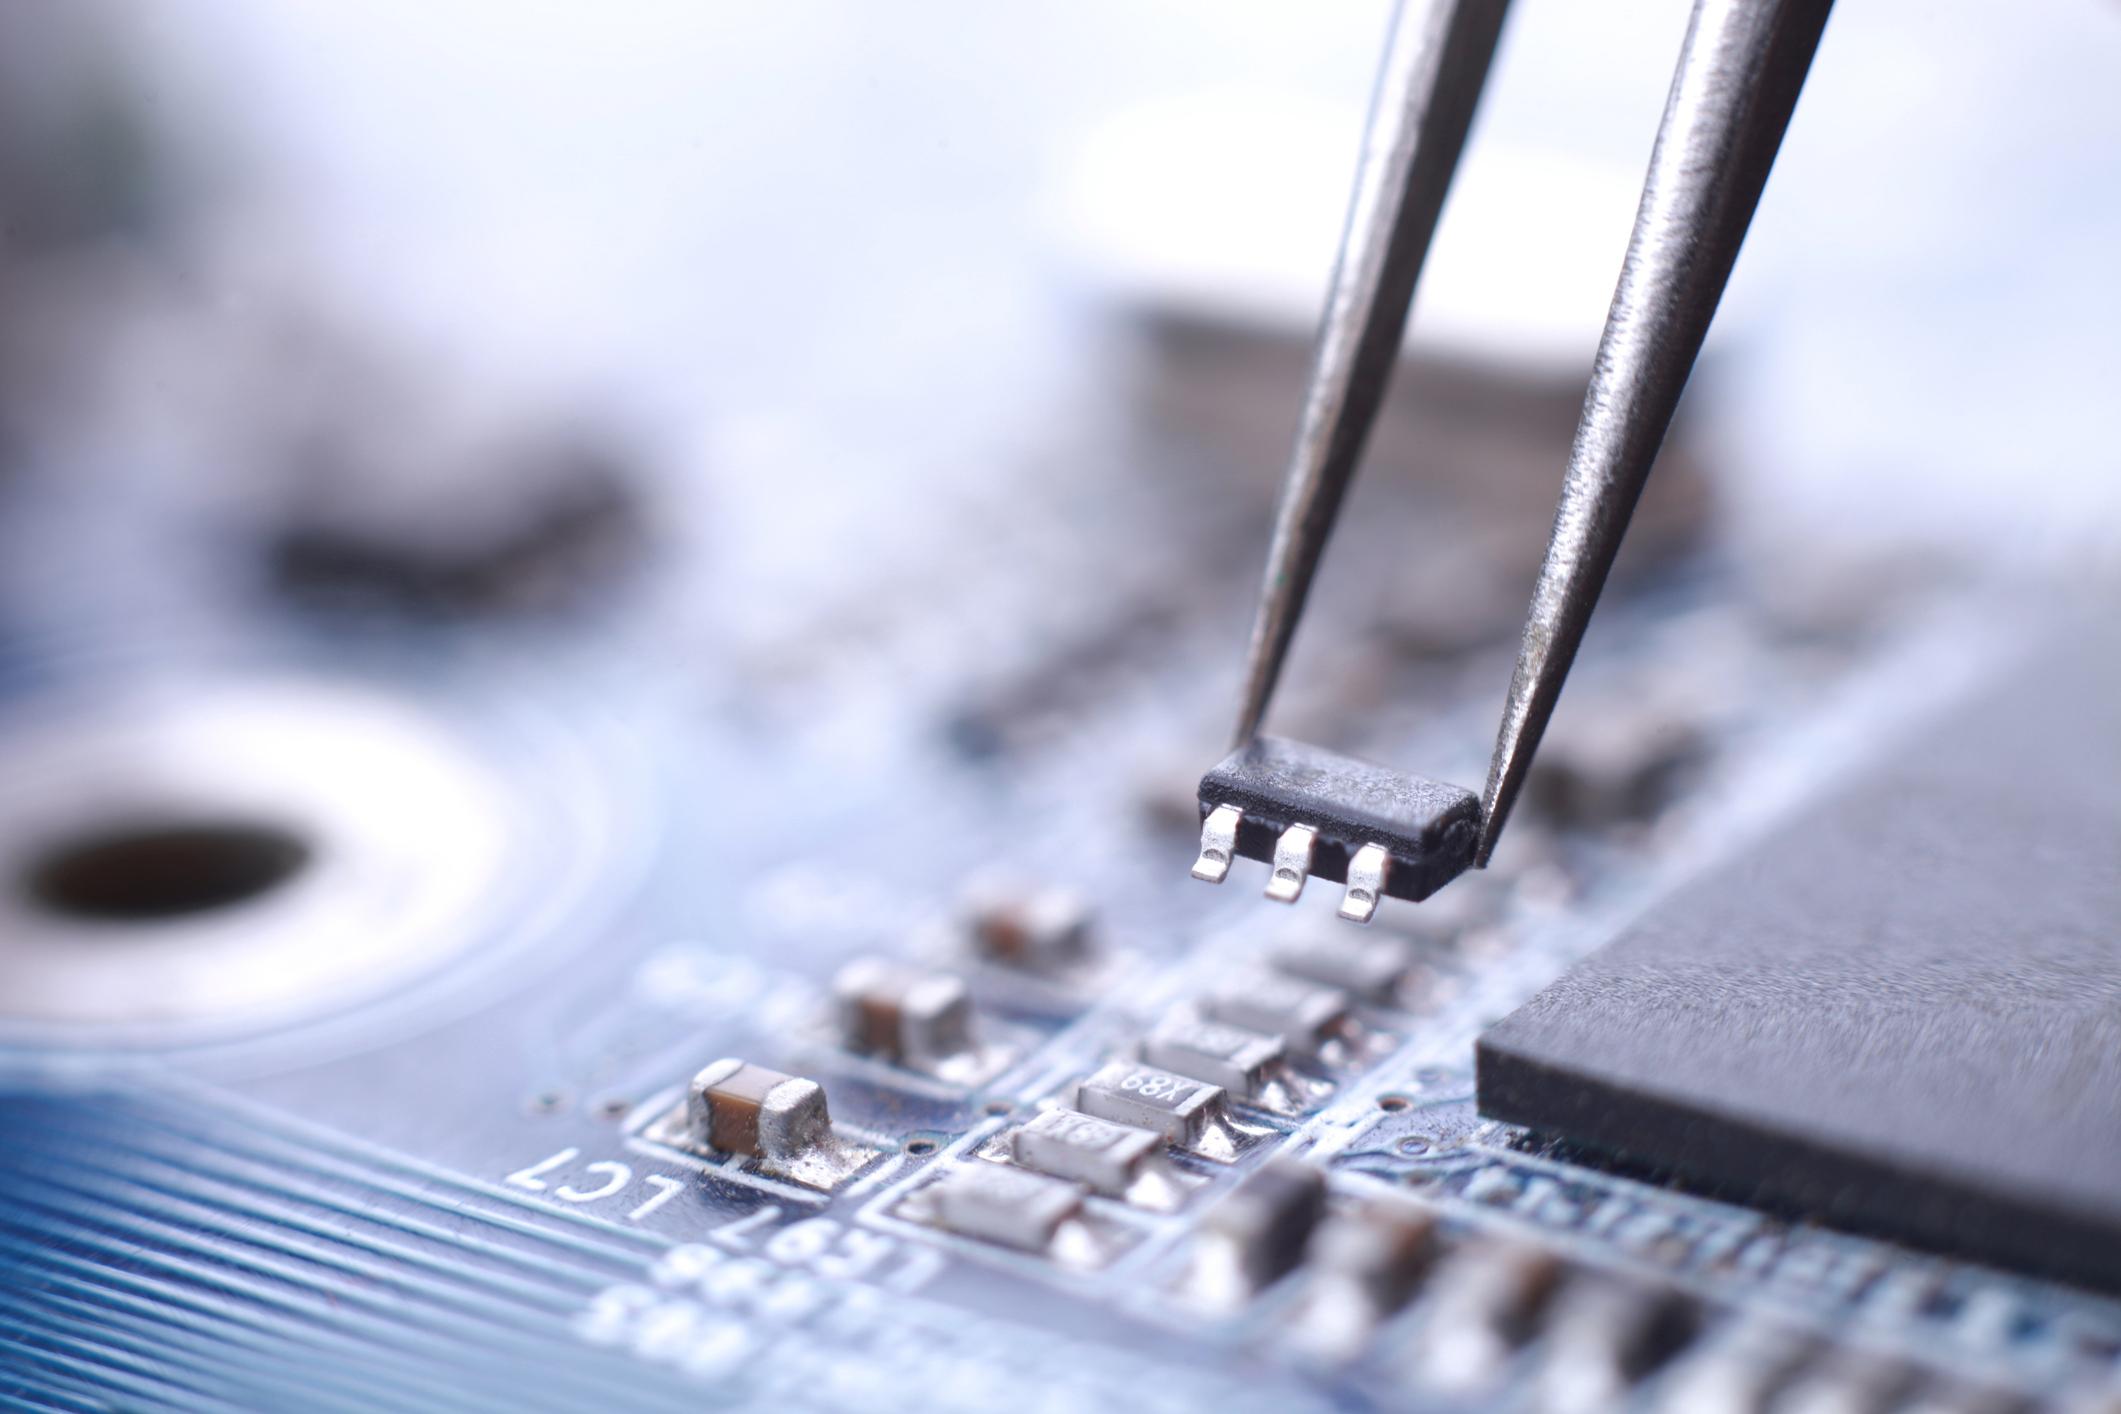 A technician installs a microchip with tweezers.